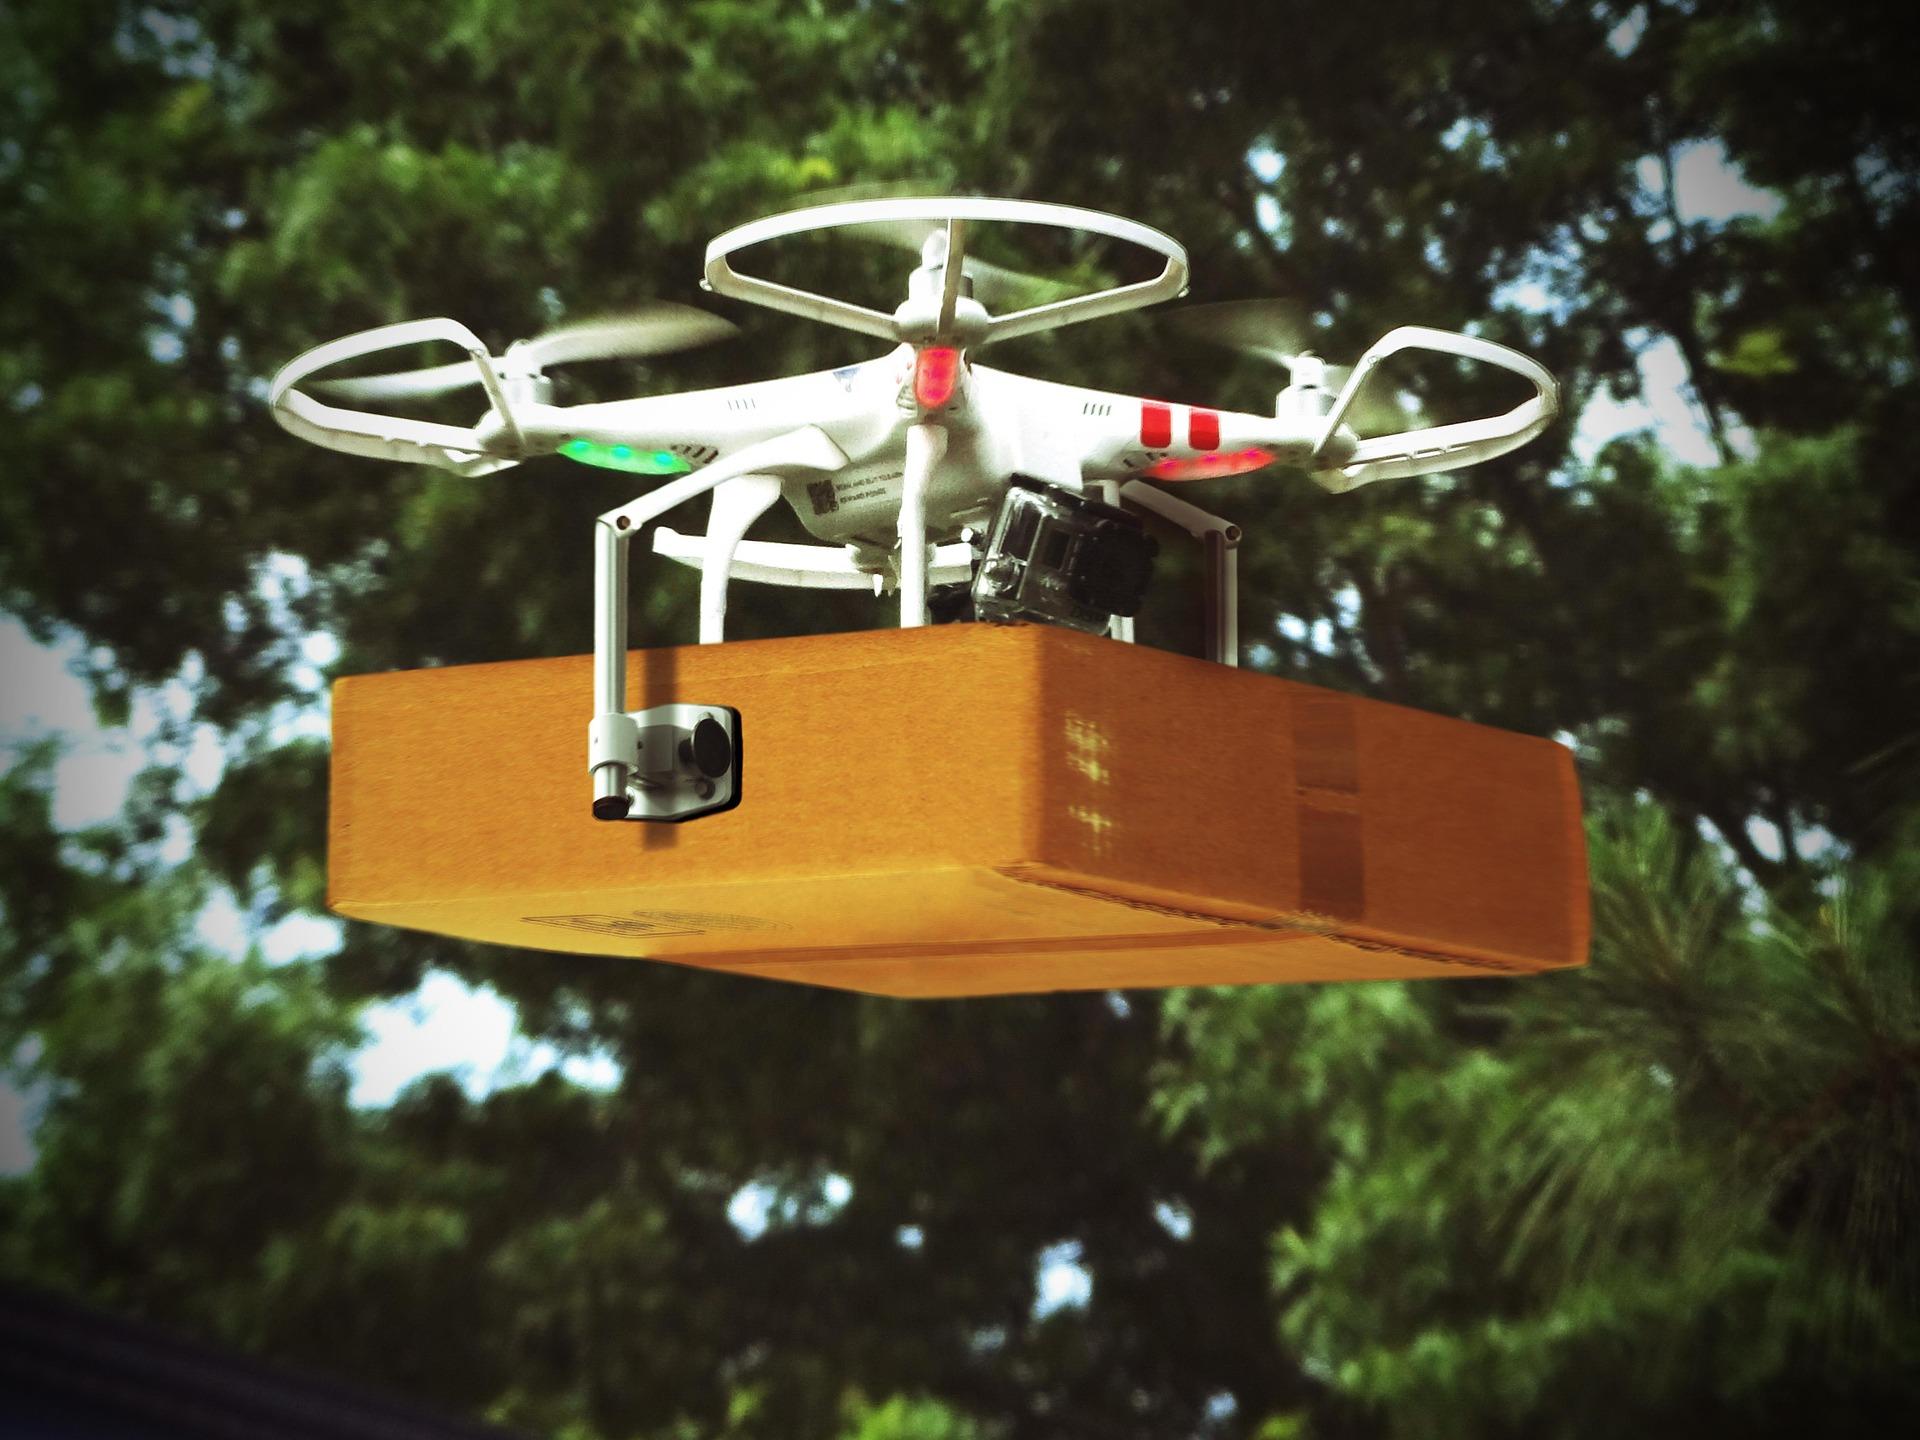 A drone delivering a parcel